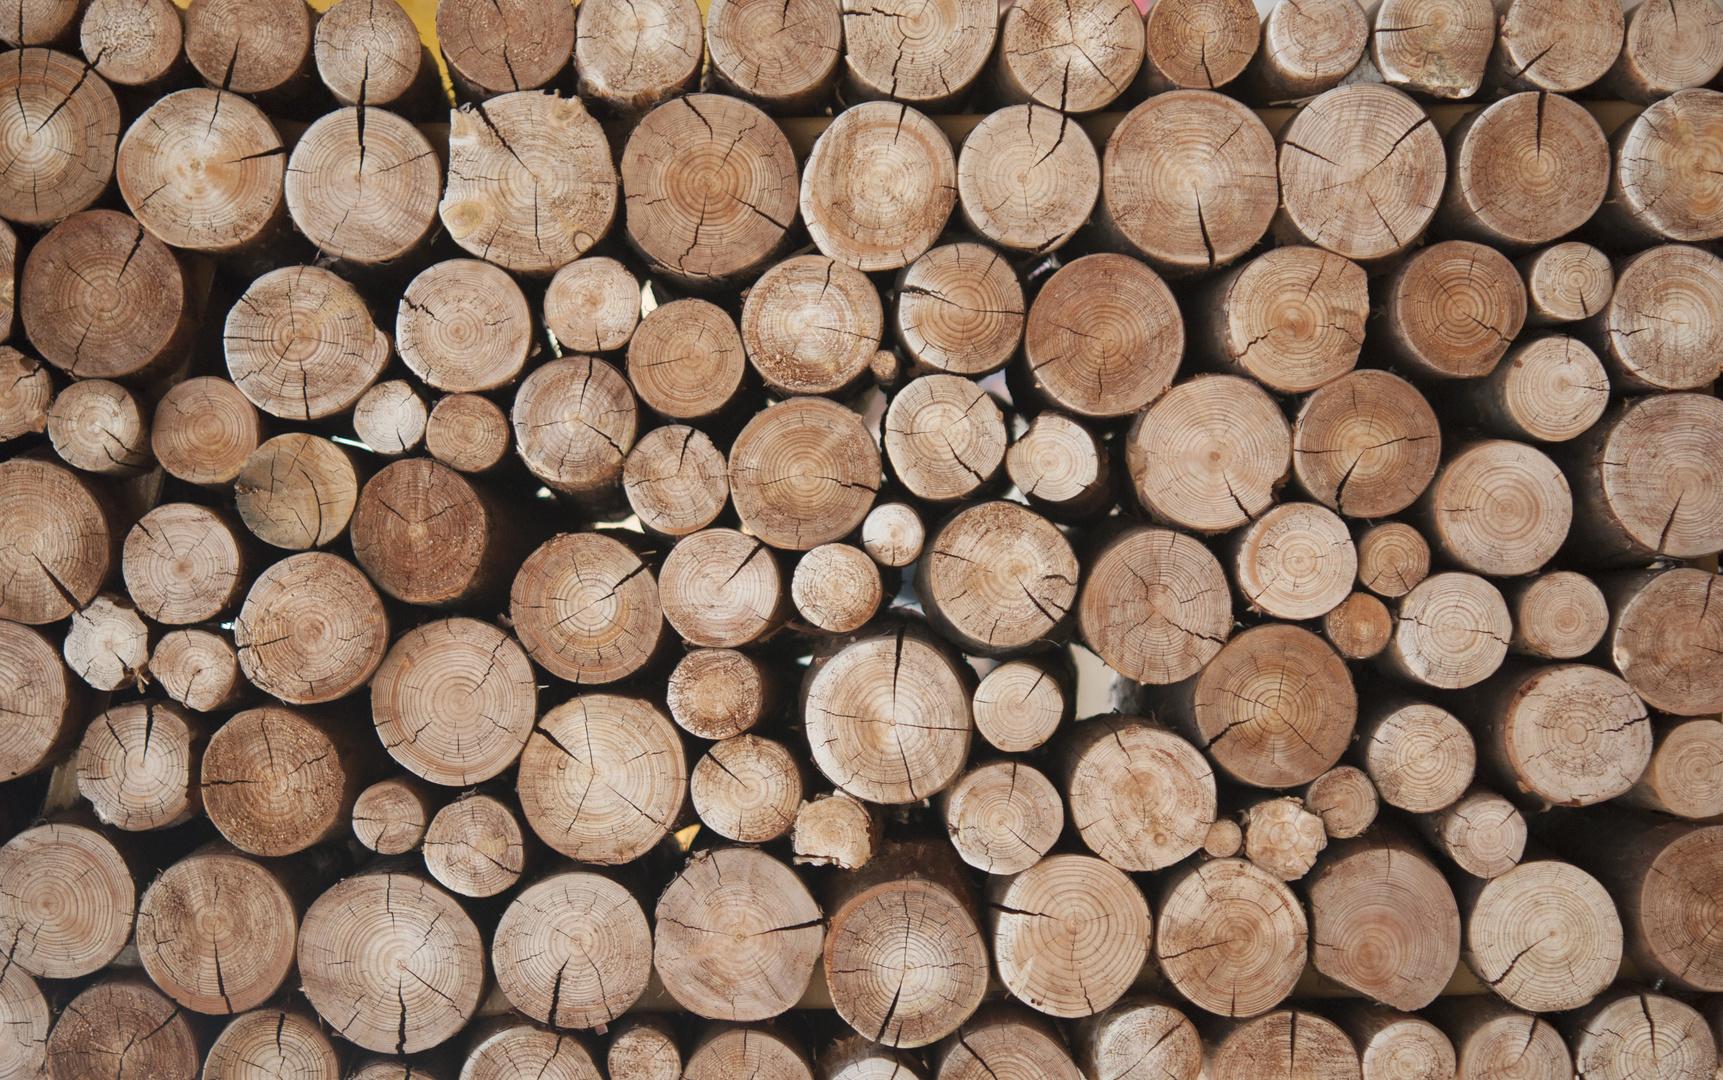 Fototapeta do kuchni - belki drewna, naturalne kolory, styl skandynawski